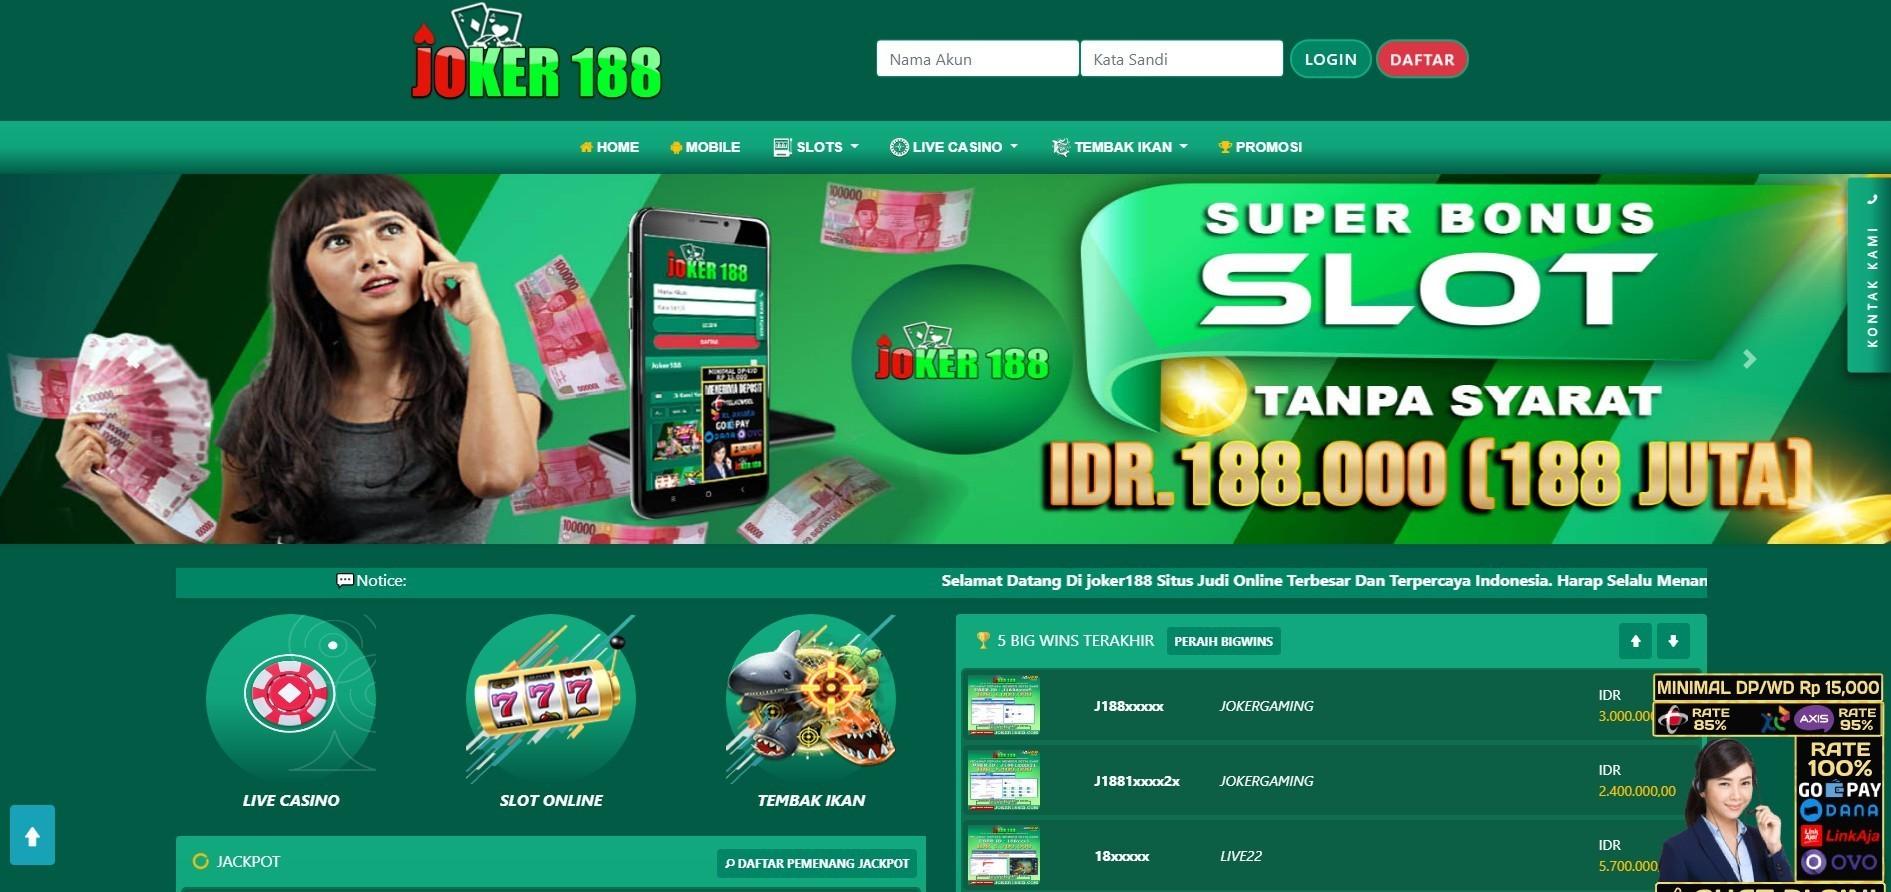 Jual Tiket Joker188 Situs Mesin Slots Online Deposit Aplikasi Gopay Loket Com